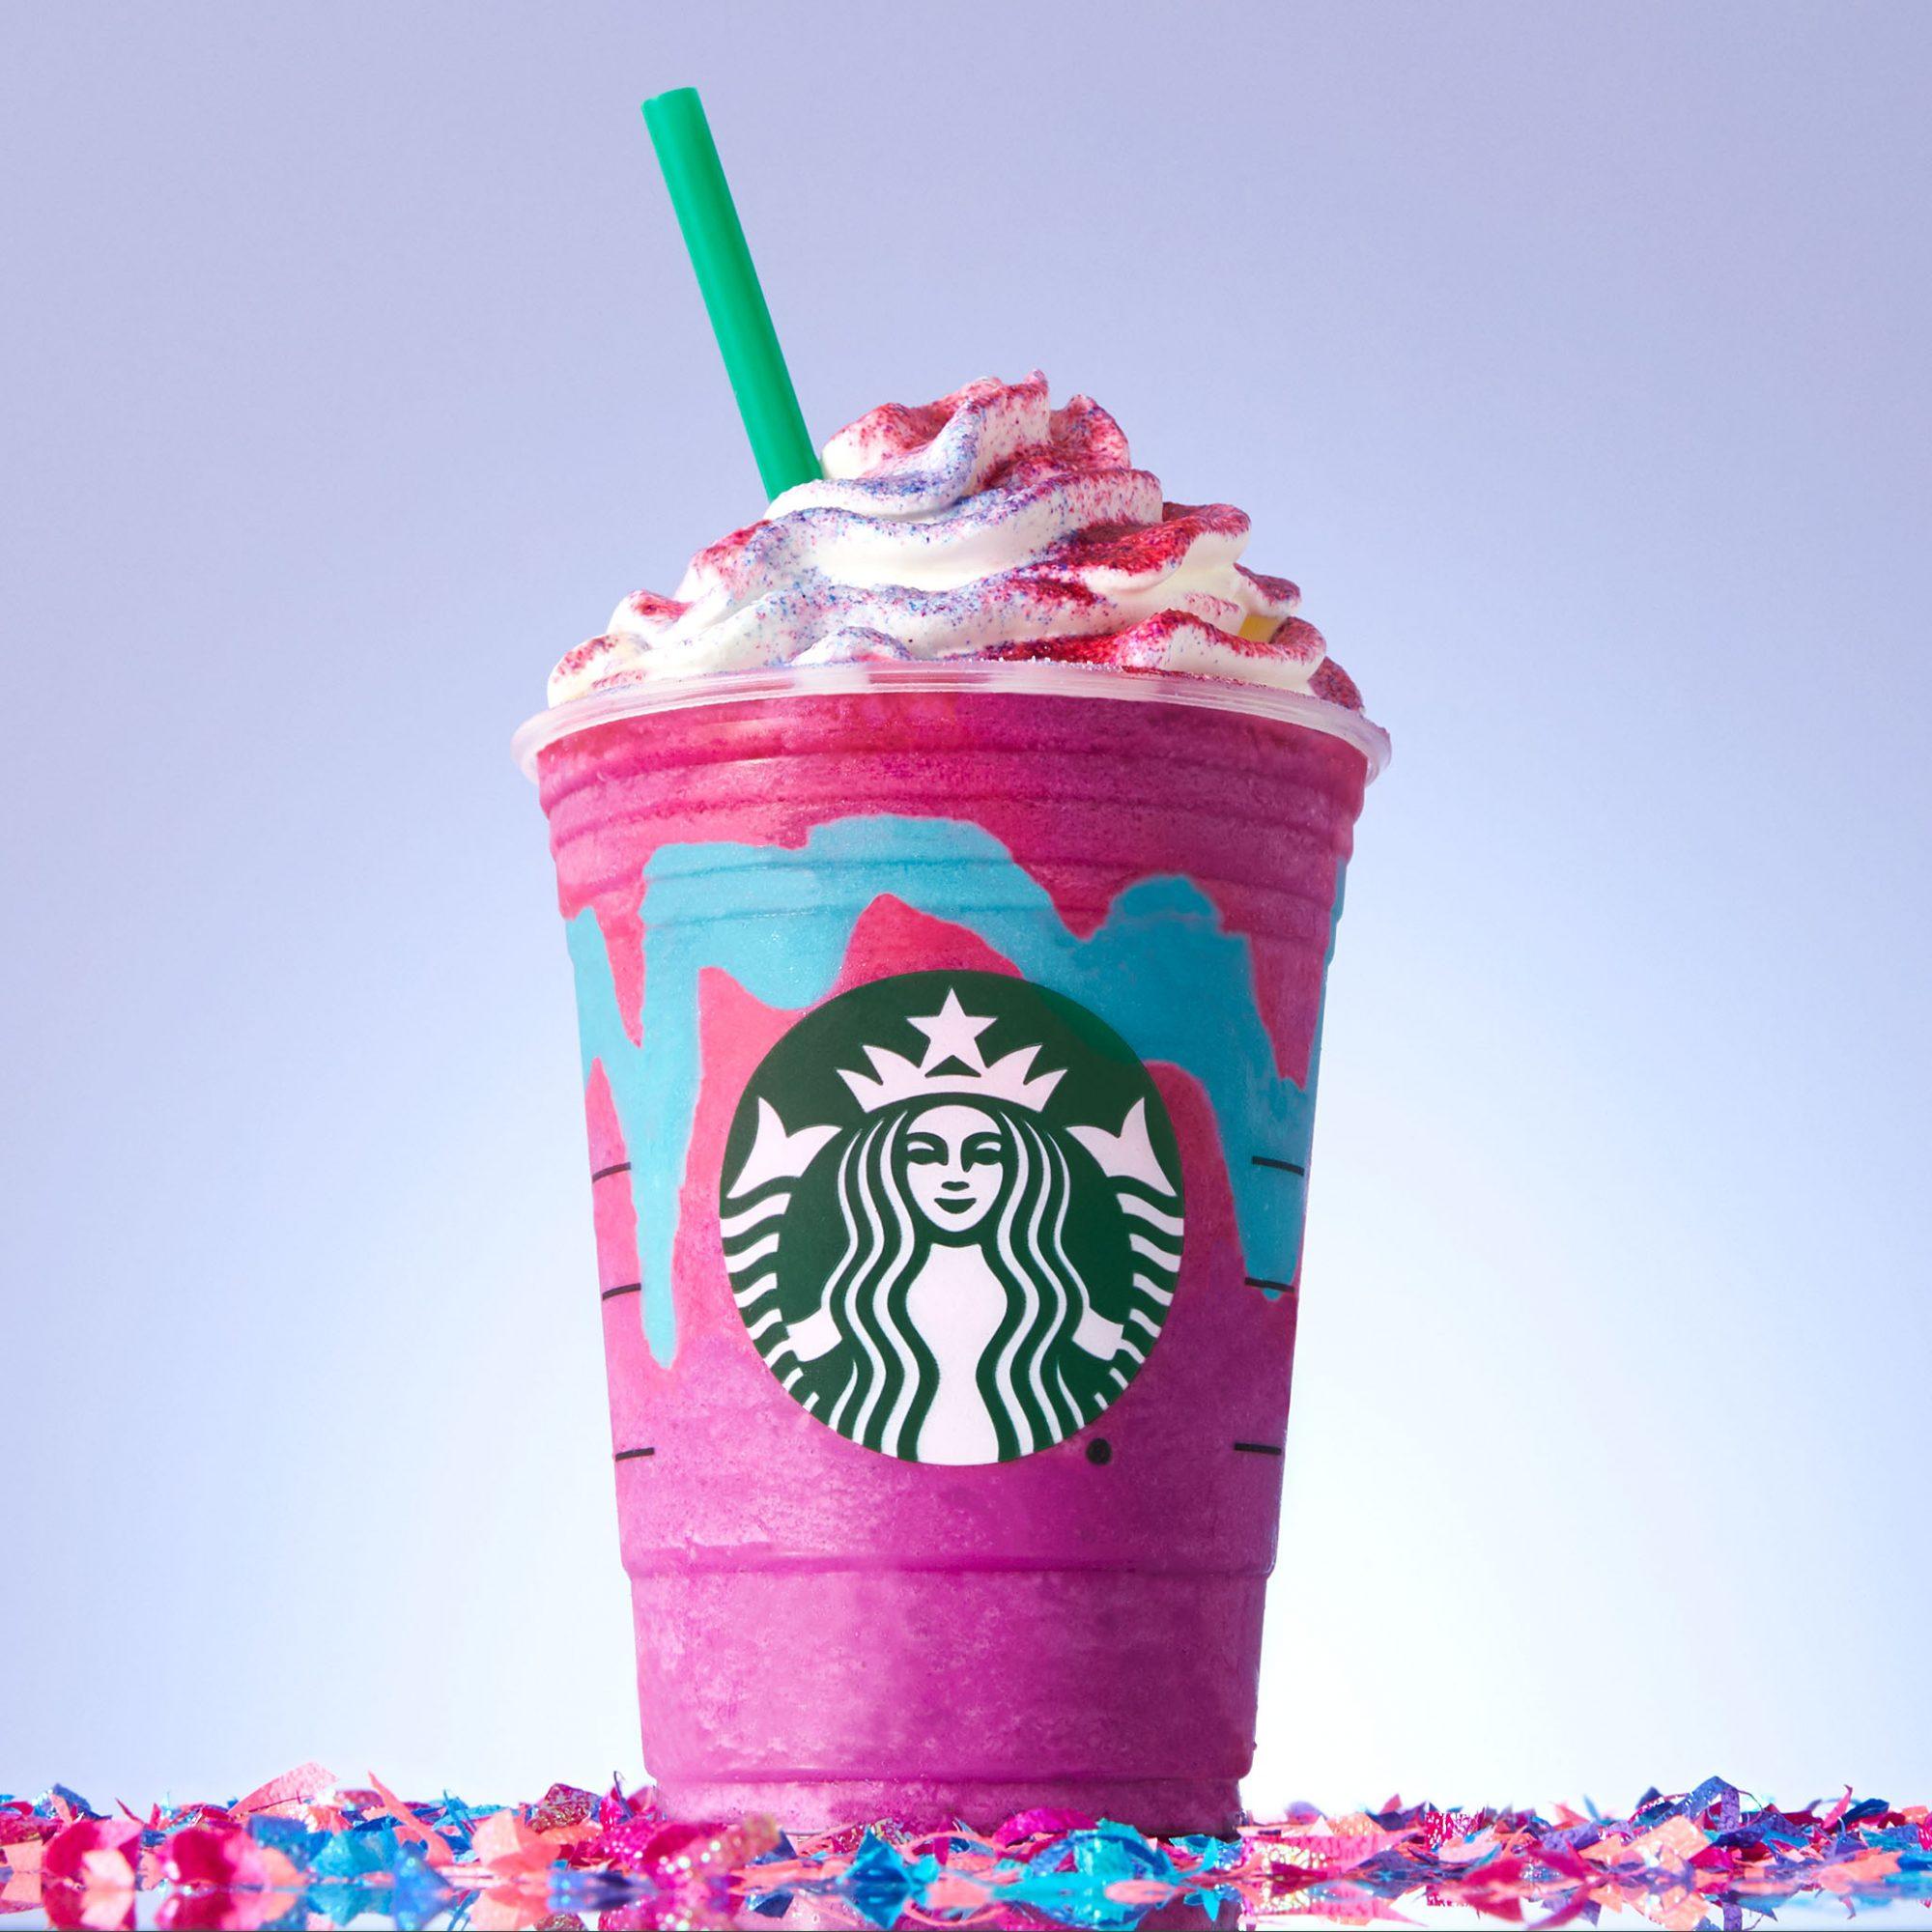 EC: Here's What Starbucks' Unicorn Frappuccino Actually Tastes Like